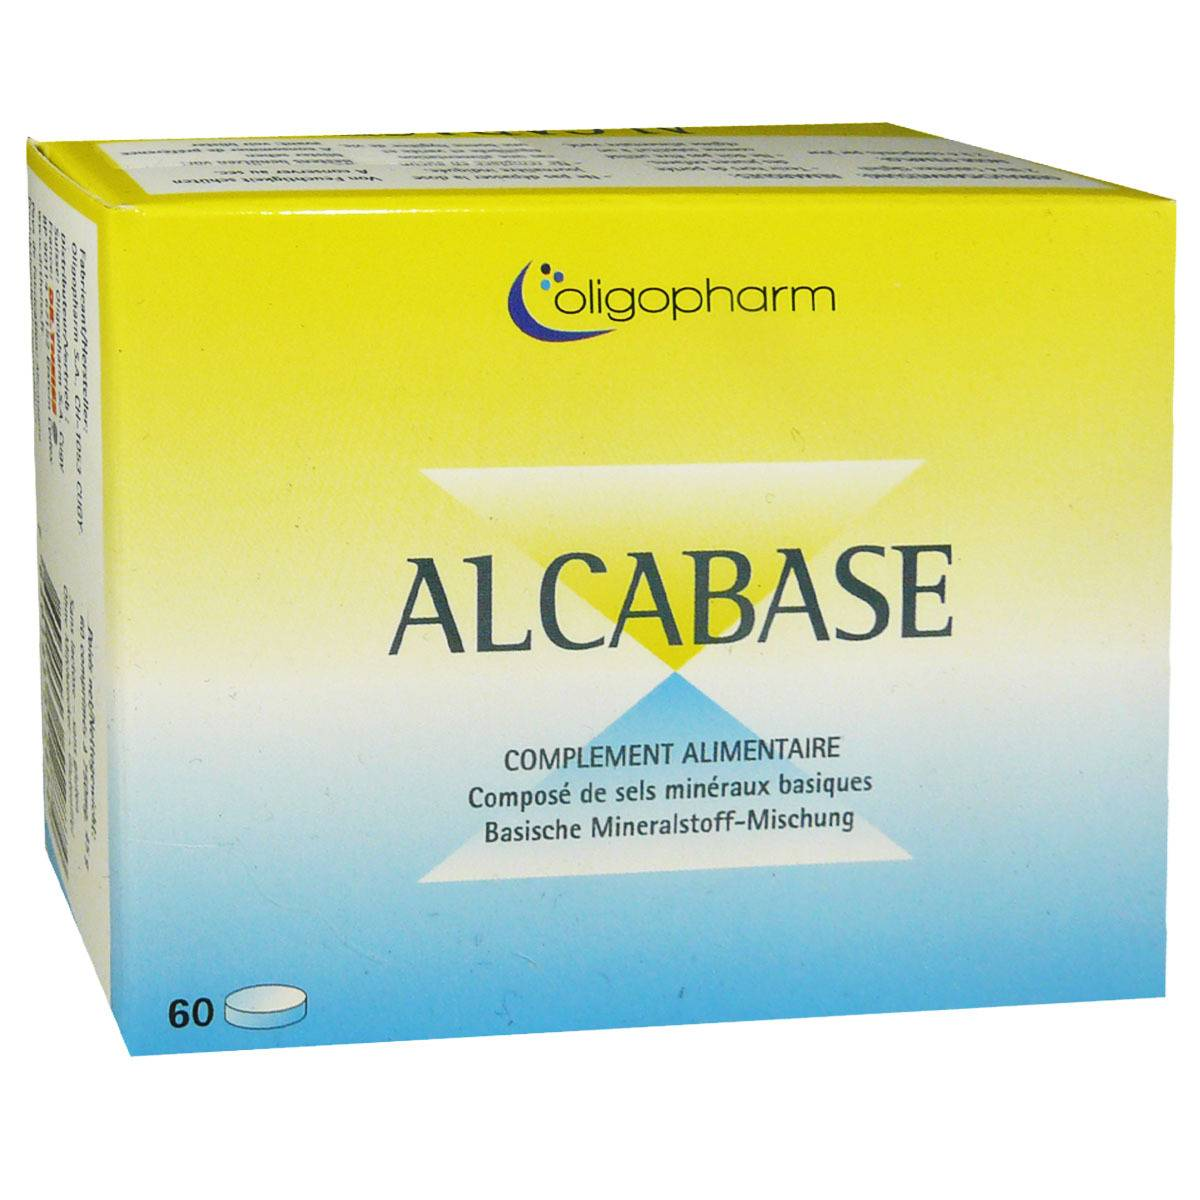 DR. THEISS Alcabase a base de sels mineraux basiques 60 comprimes